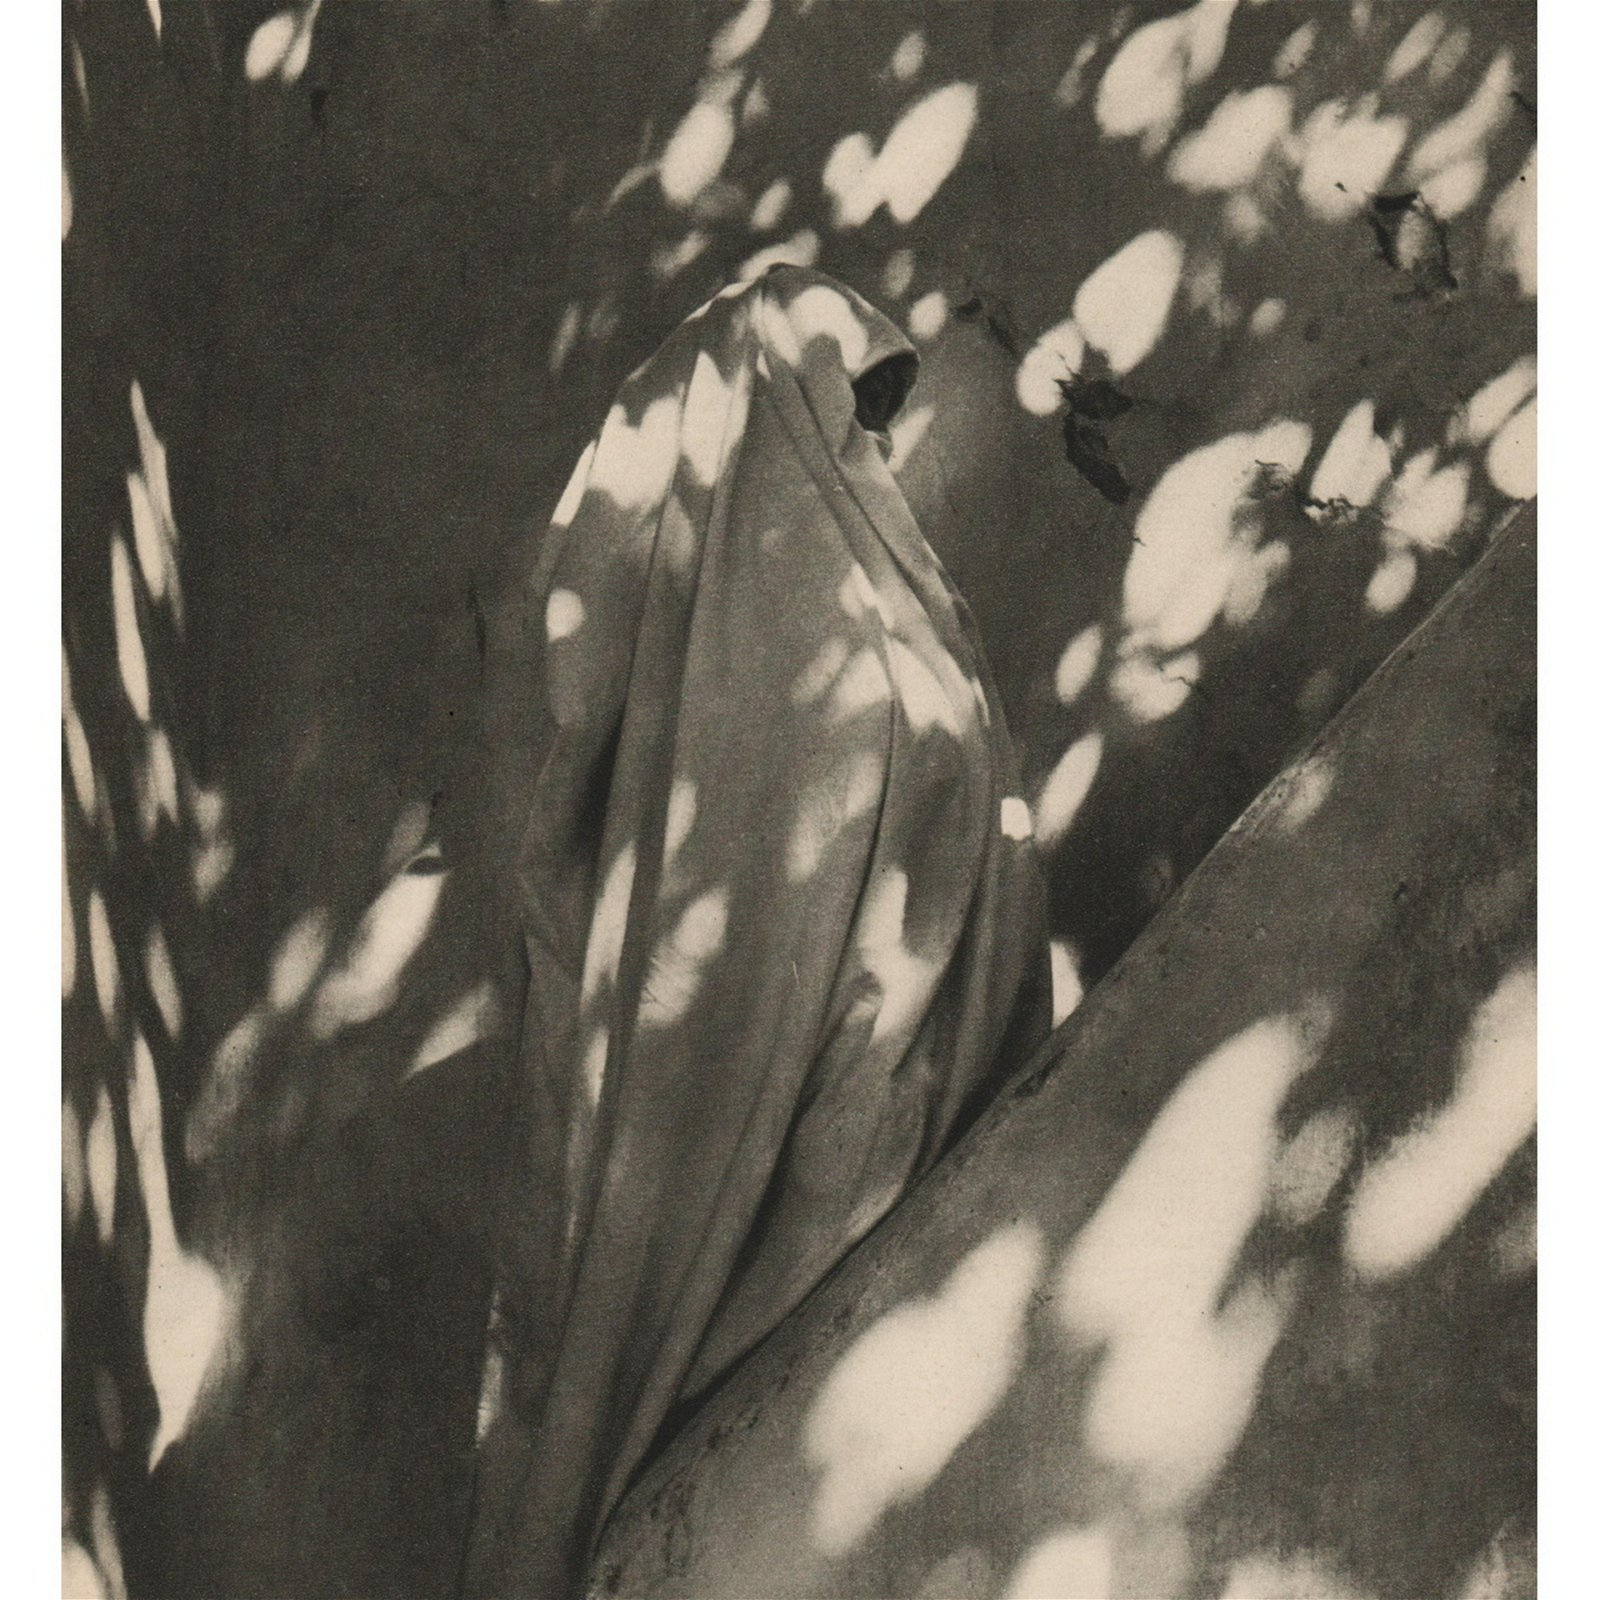 CECIL BEATON - Moroccan Shadow